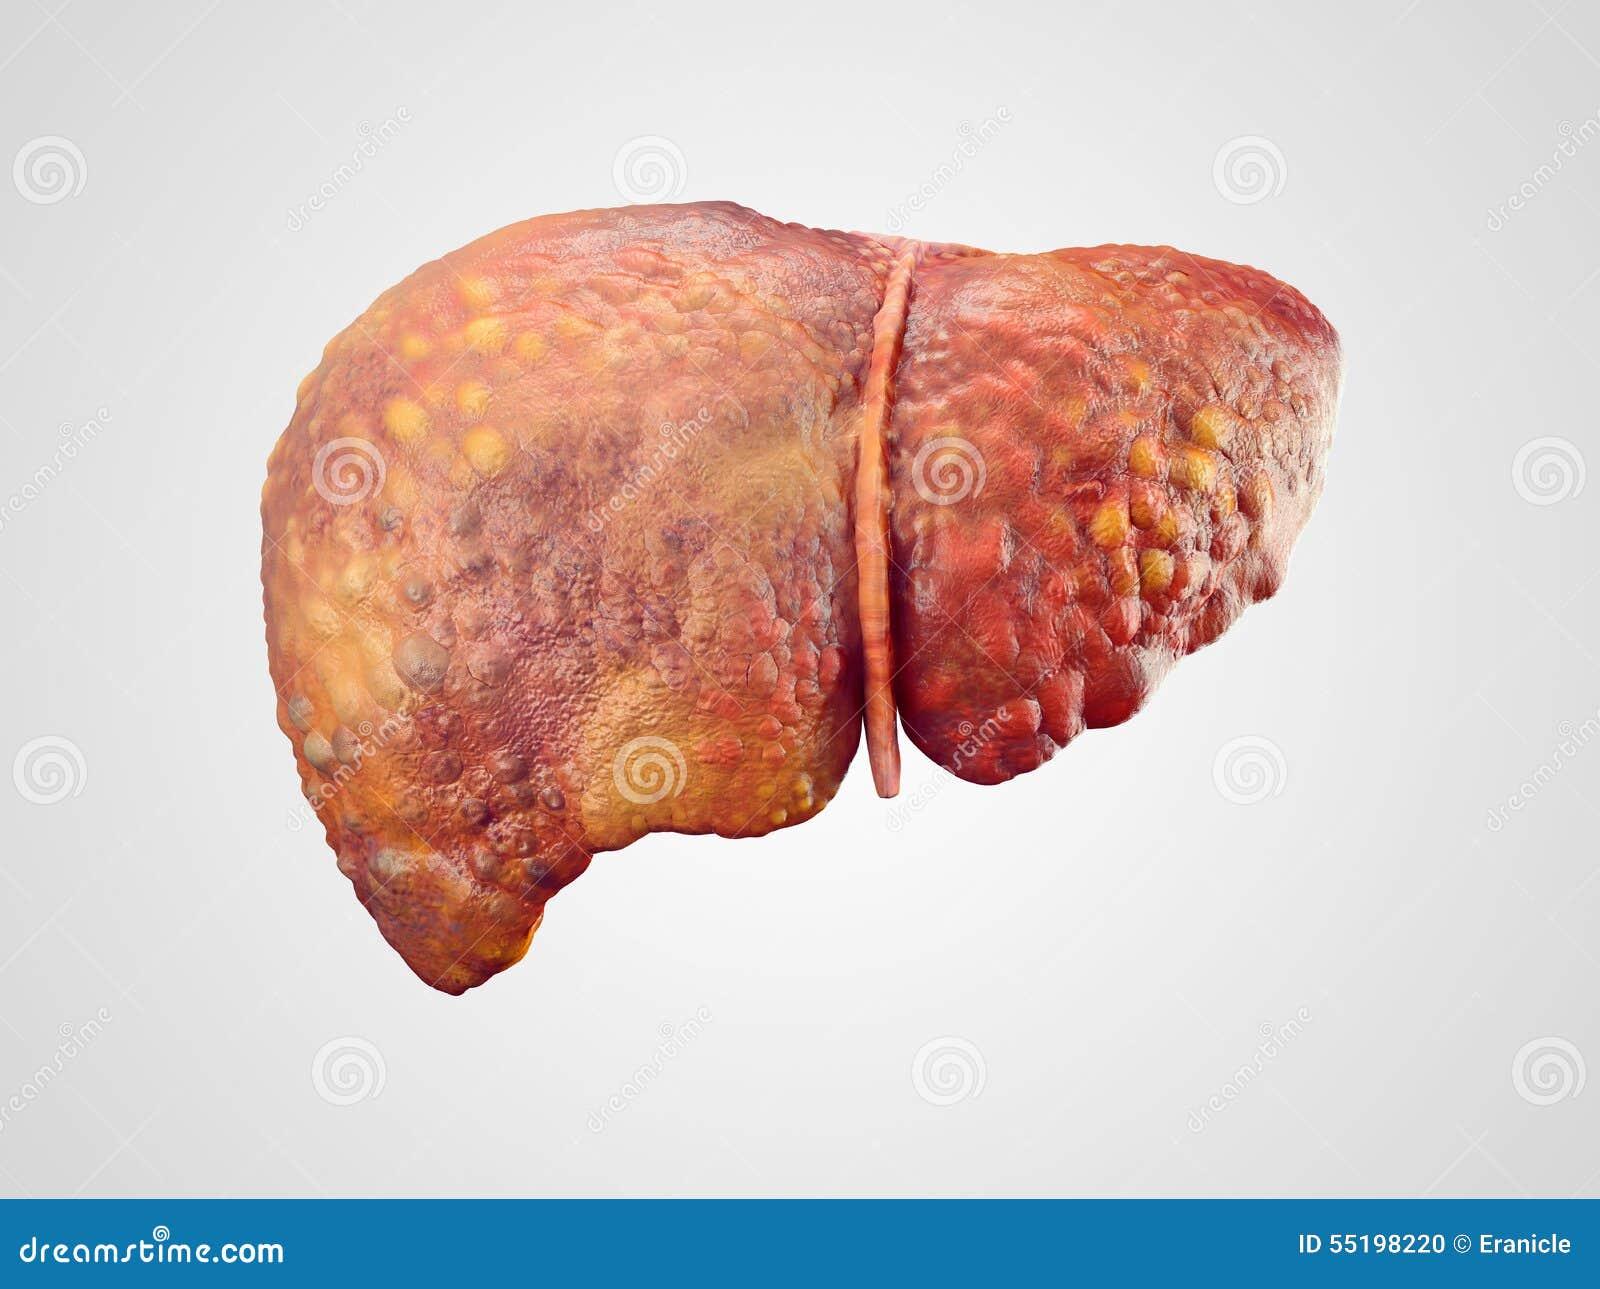 Realistic Illustration Of Cirrhosis Of Human Liver Stock ...